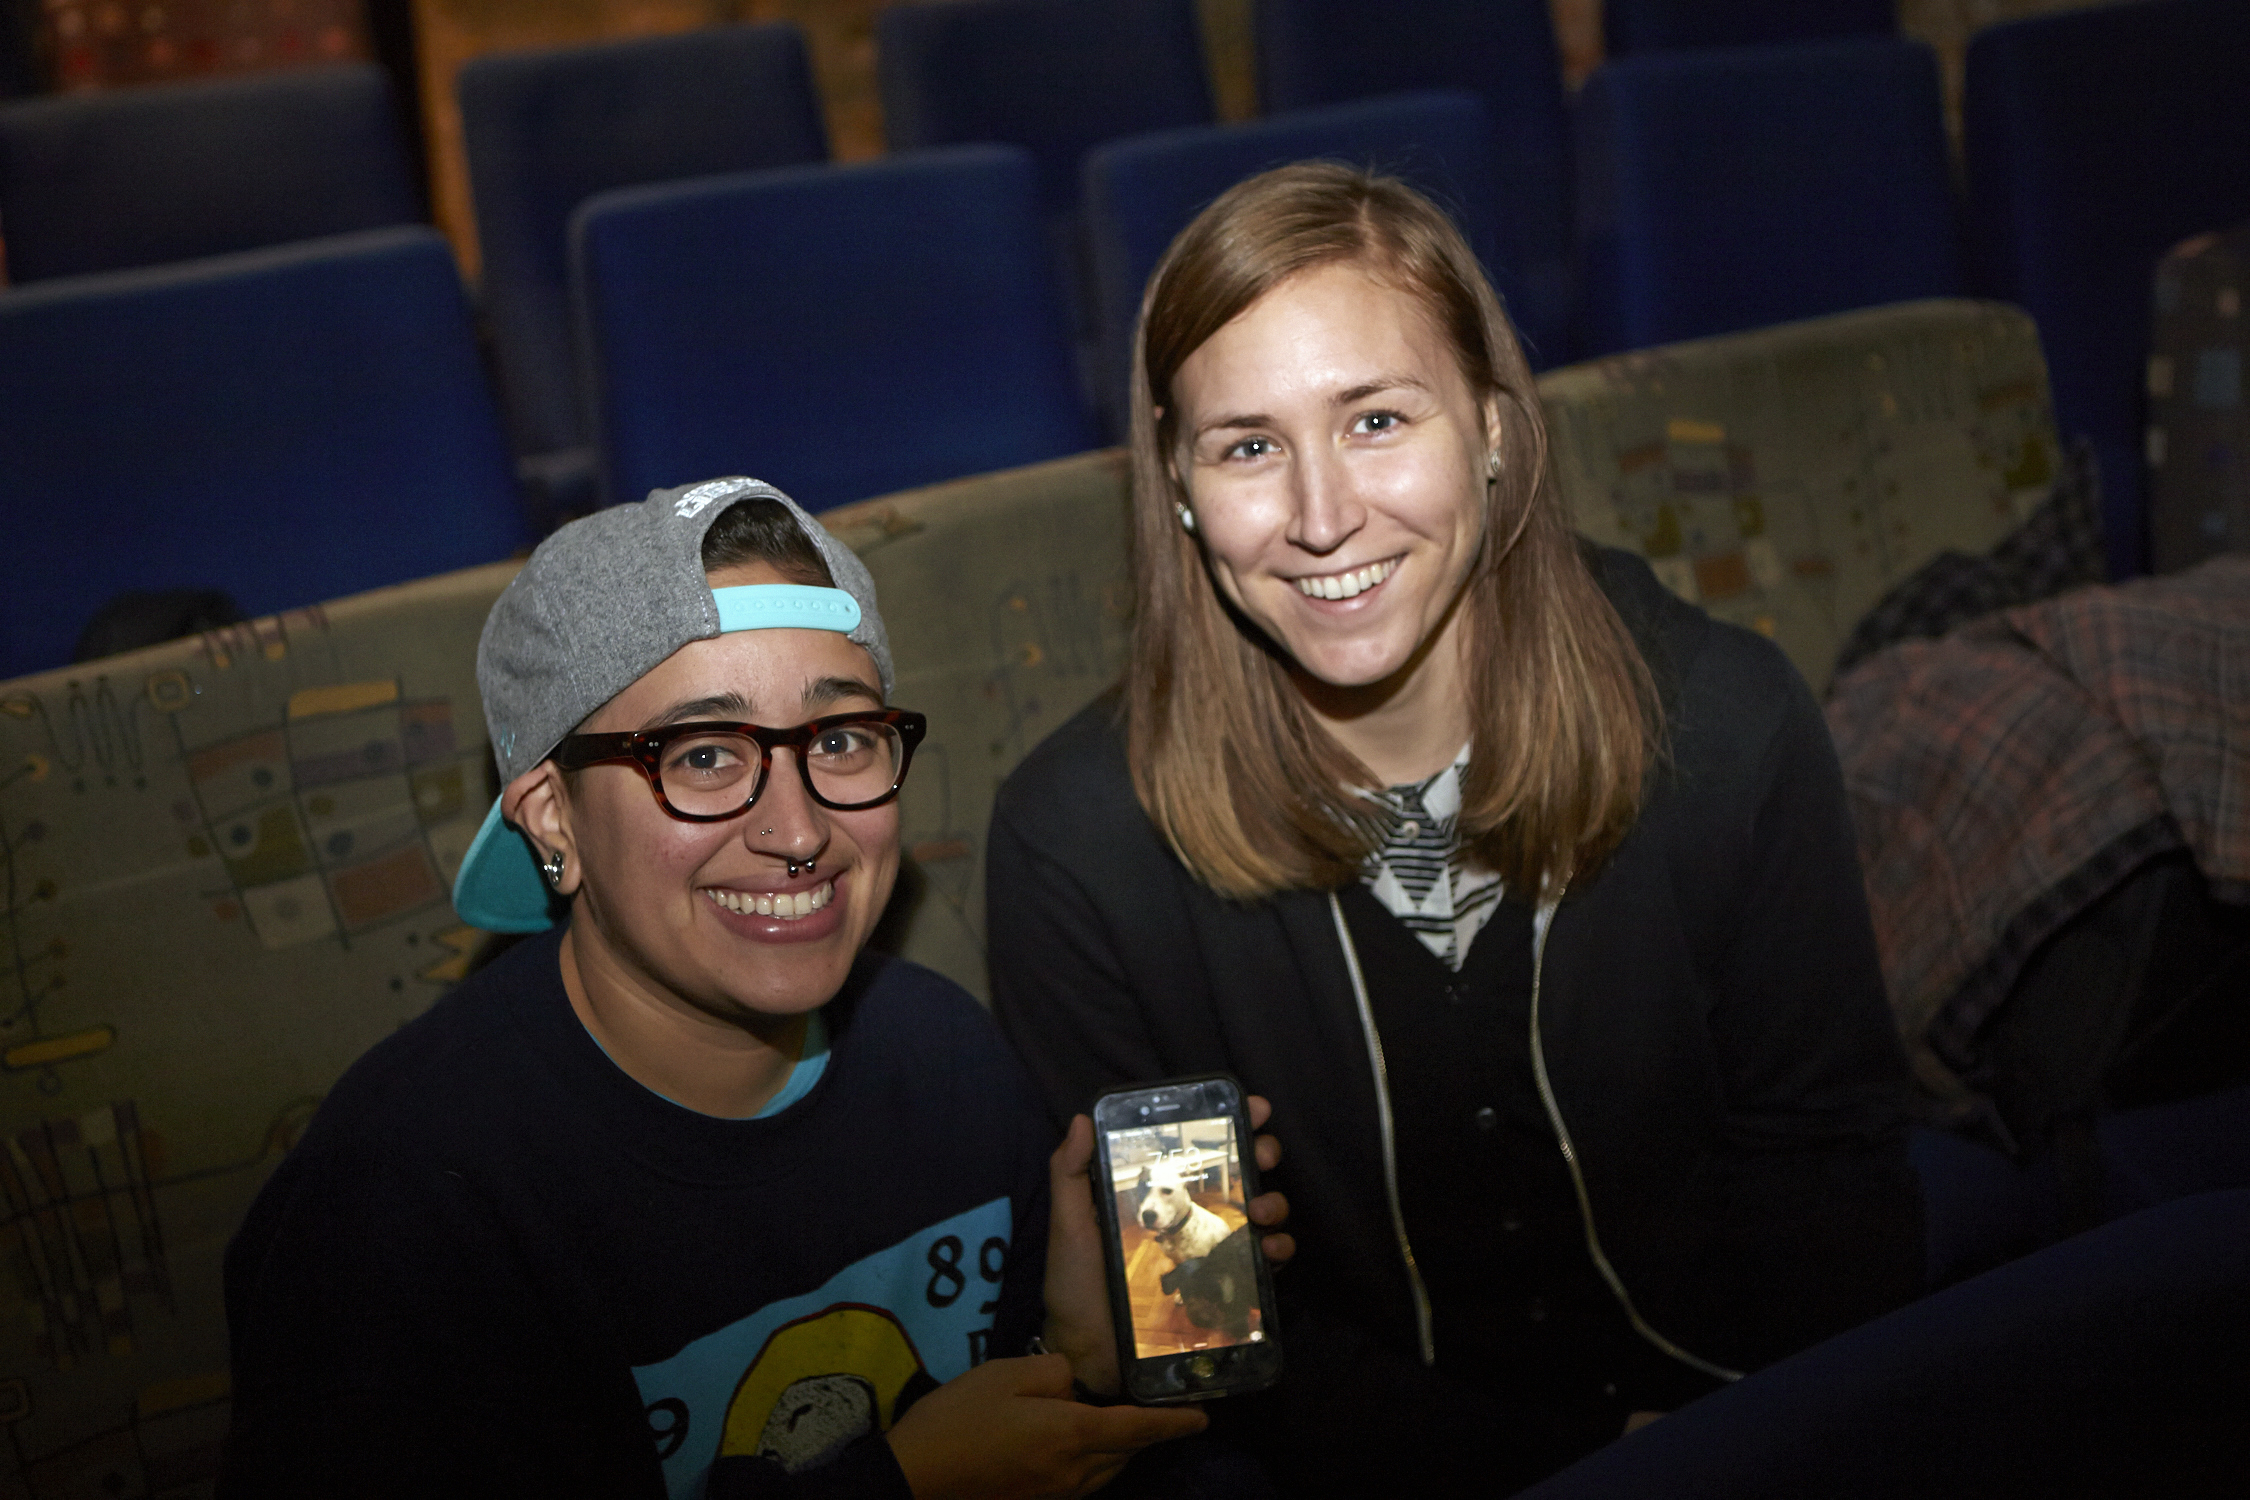 Queer|Art|Mentorship Fellow Mylo Mendez at the December 2015 screening of  Natural Born Killers. (Photo by Eric McNatt)